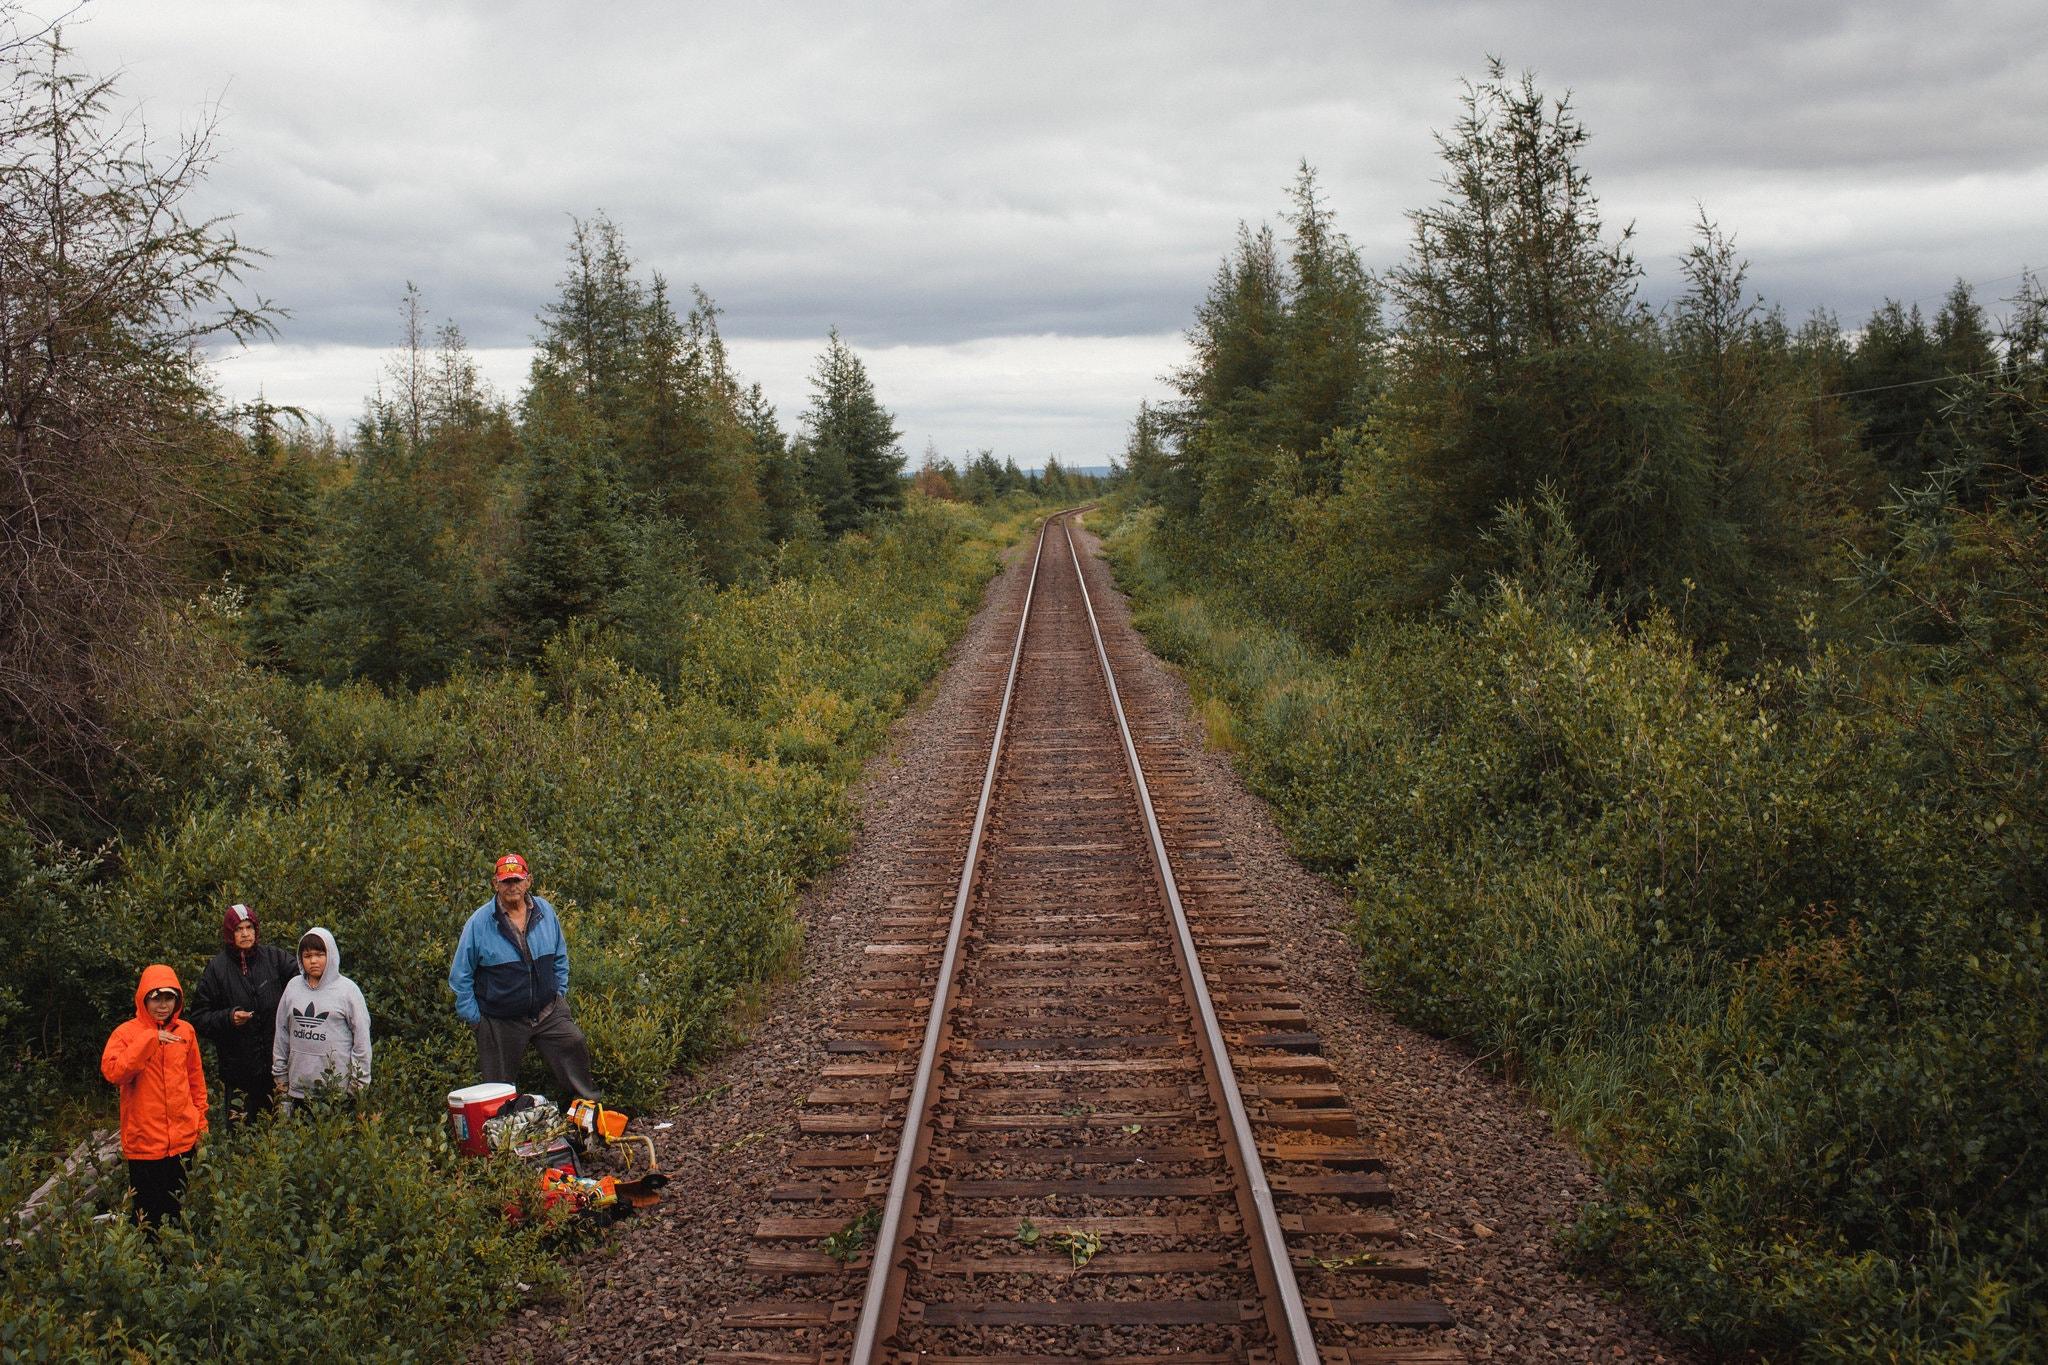 Tshiuetin Railroad Canada (Source: New York Times)